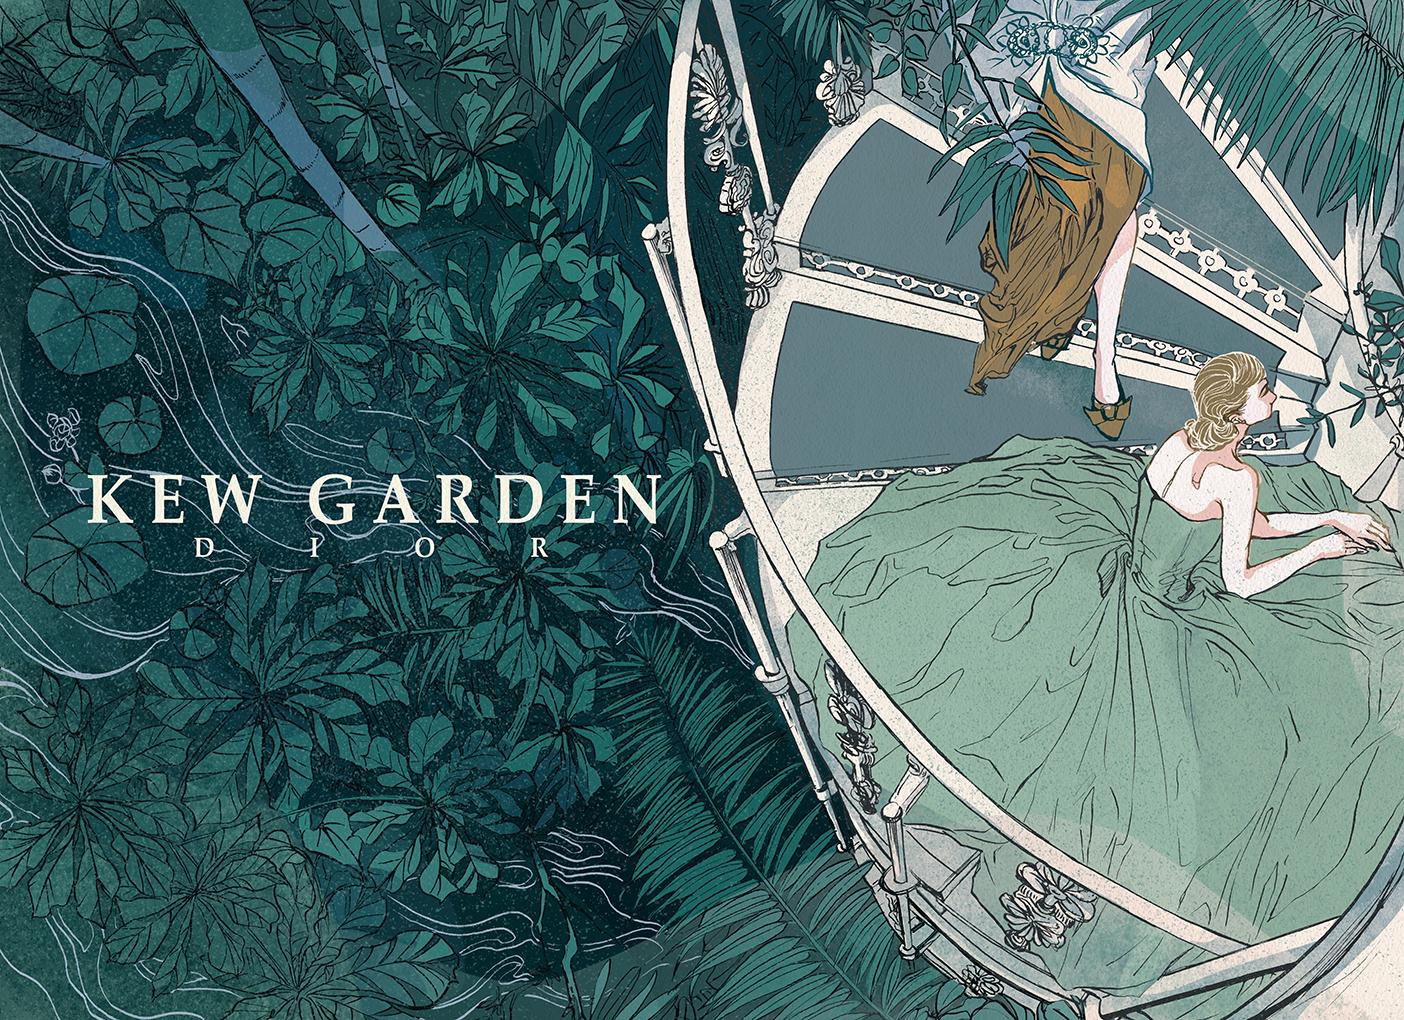 Kew Garden X Dior 1